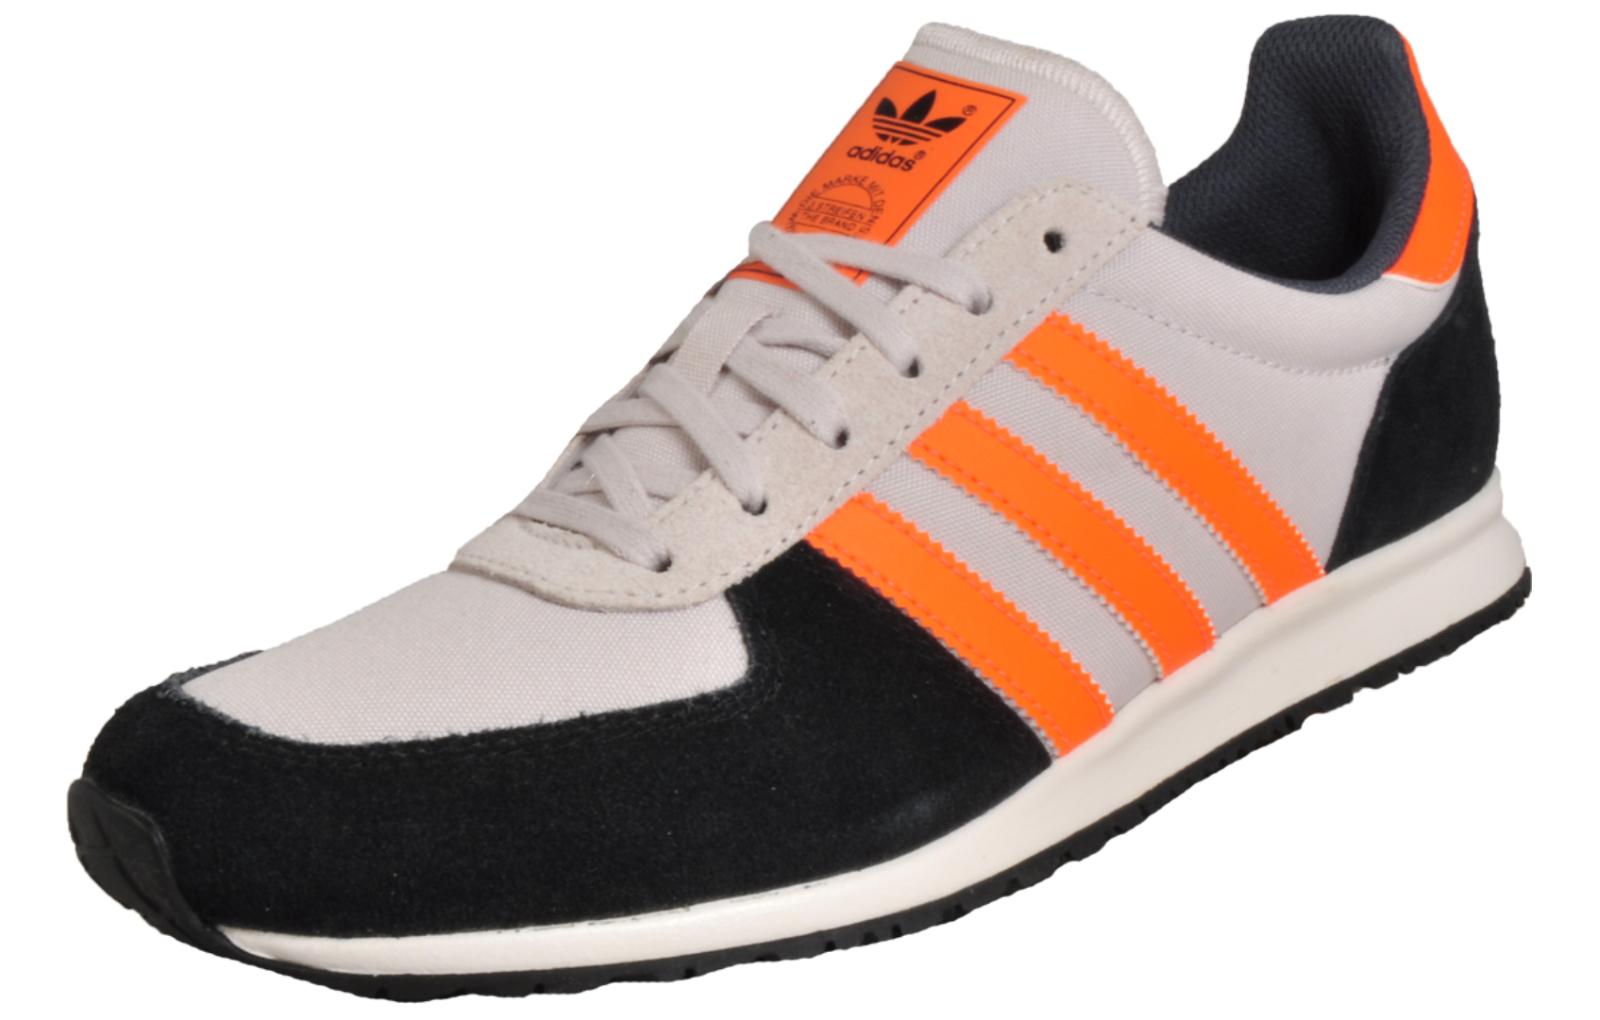 lowest price 326c3 5cddb Adidas Orignals Adistar Racer Mens - AD172973